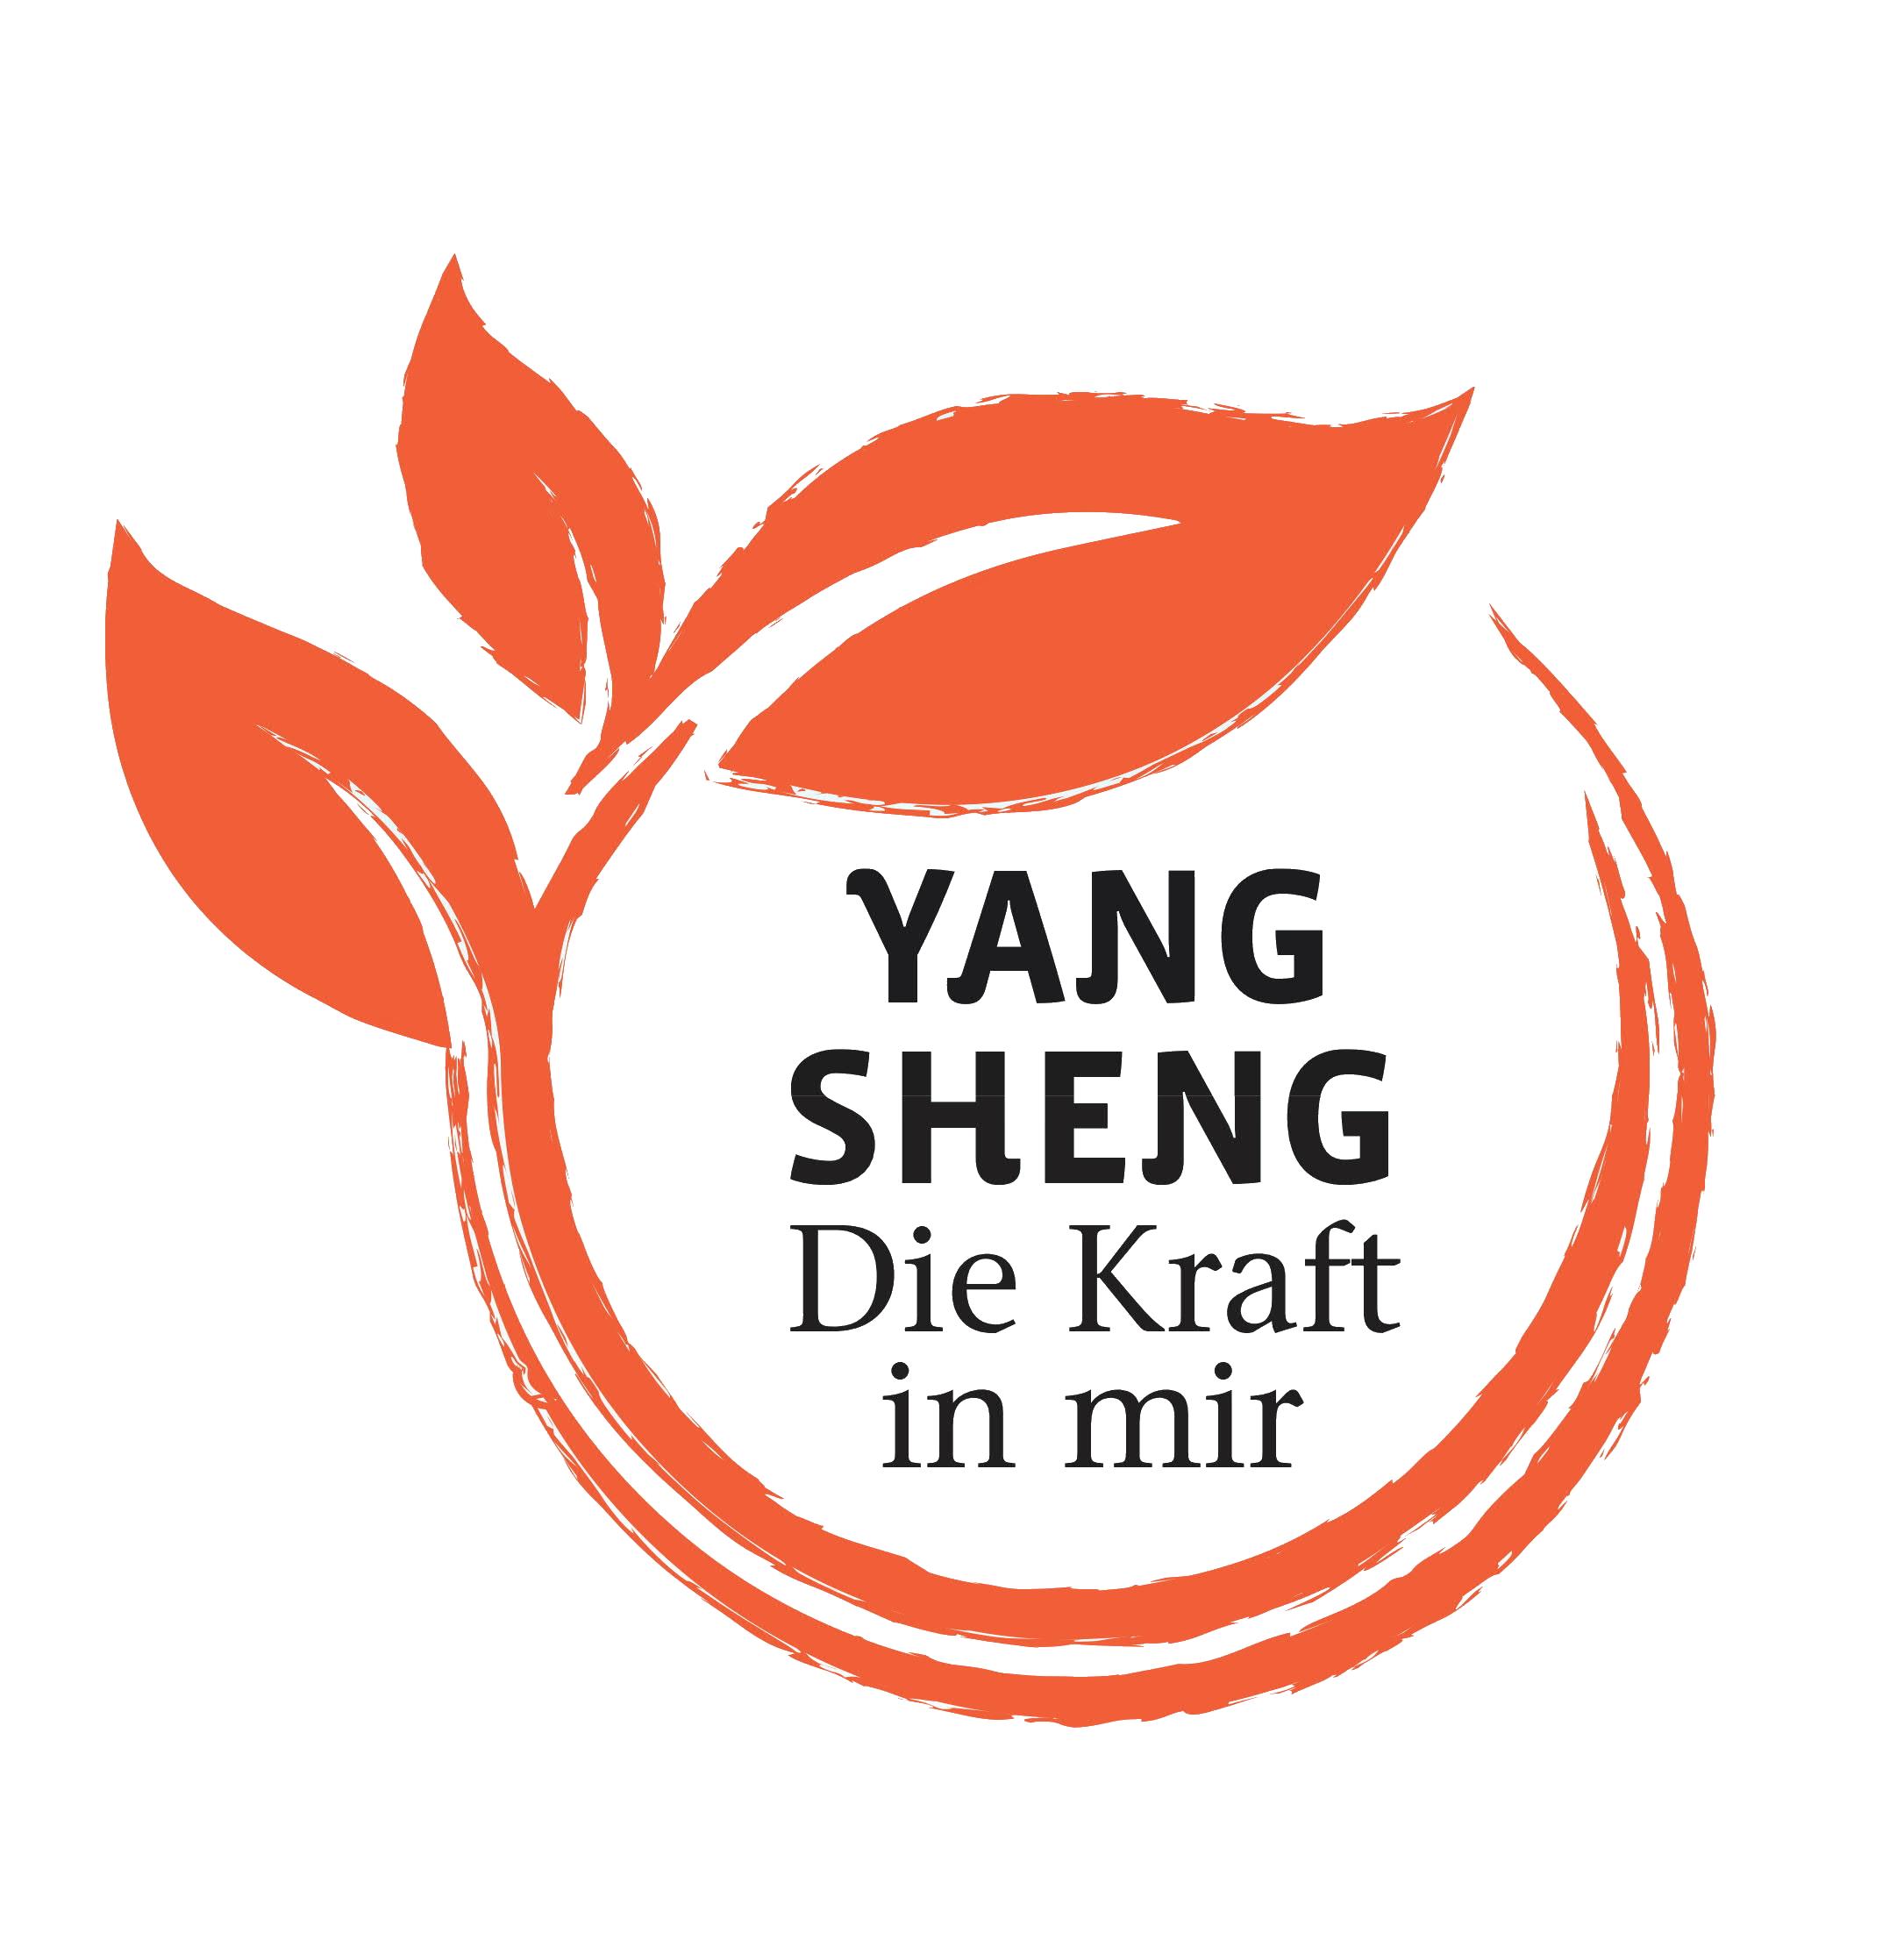 Logo Yang Sheng Die Kraft in mir